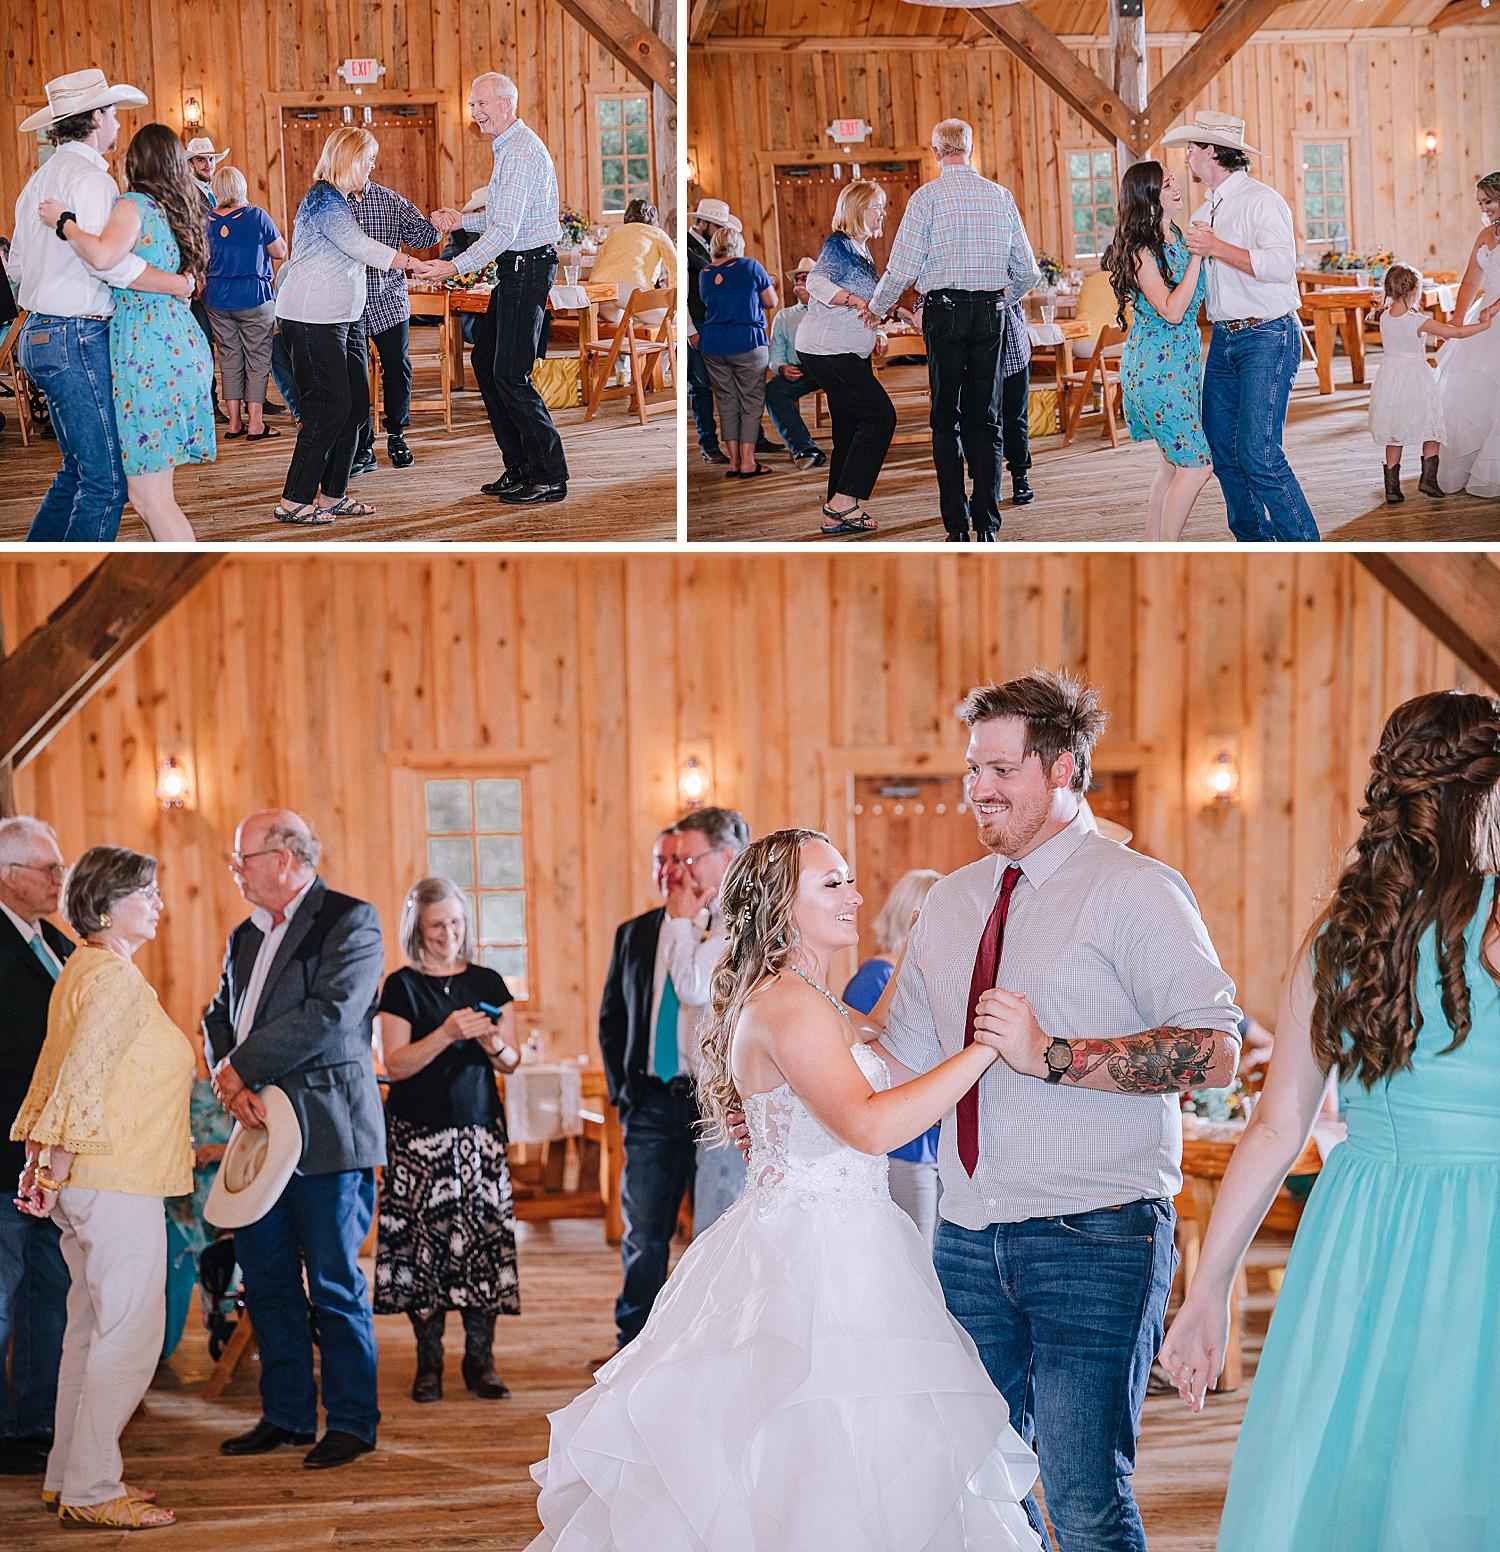 Carly-Barton-Photography-Old-Town-Texas-Rustic-Wedding-Photos-Sunflowers-Boots-Kyle-Texas_0079.jpg